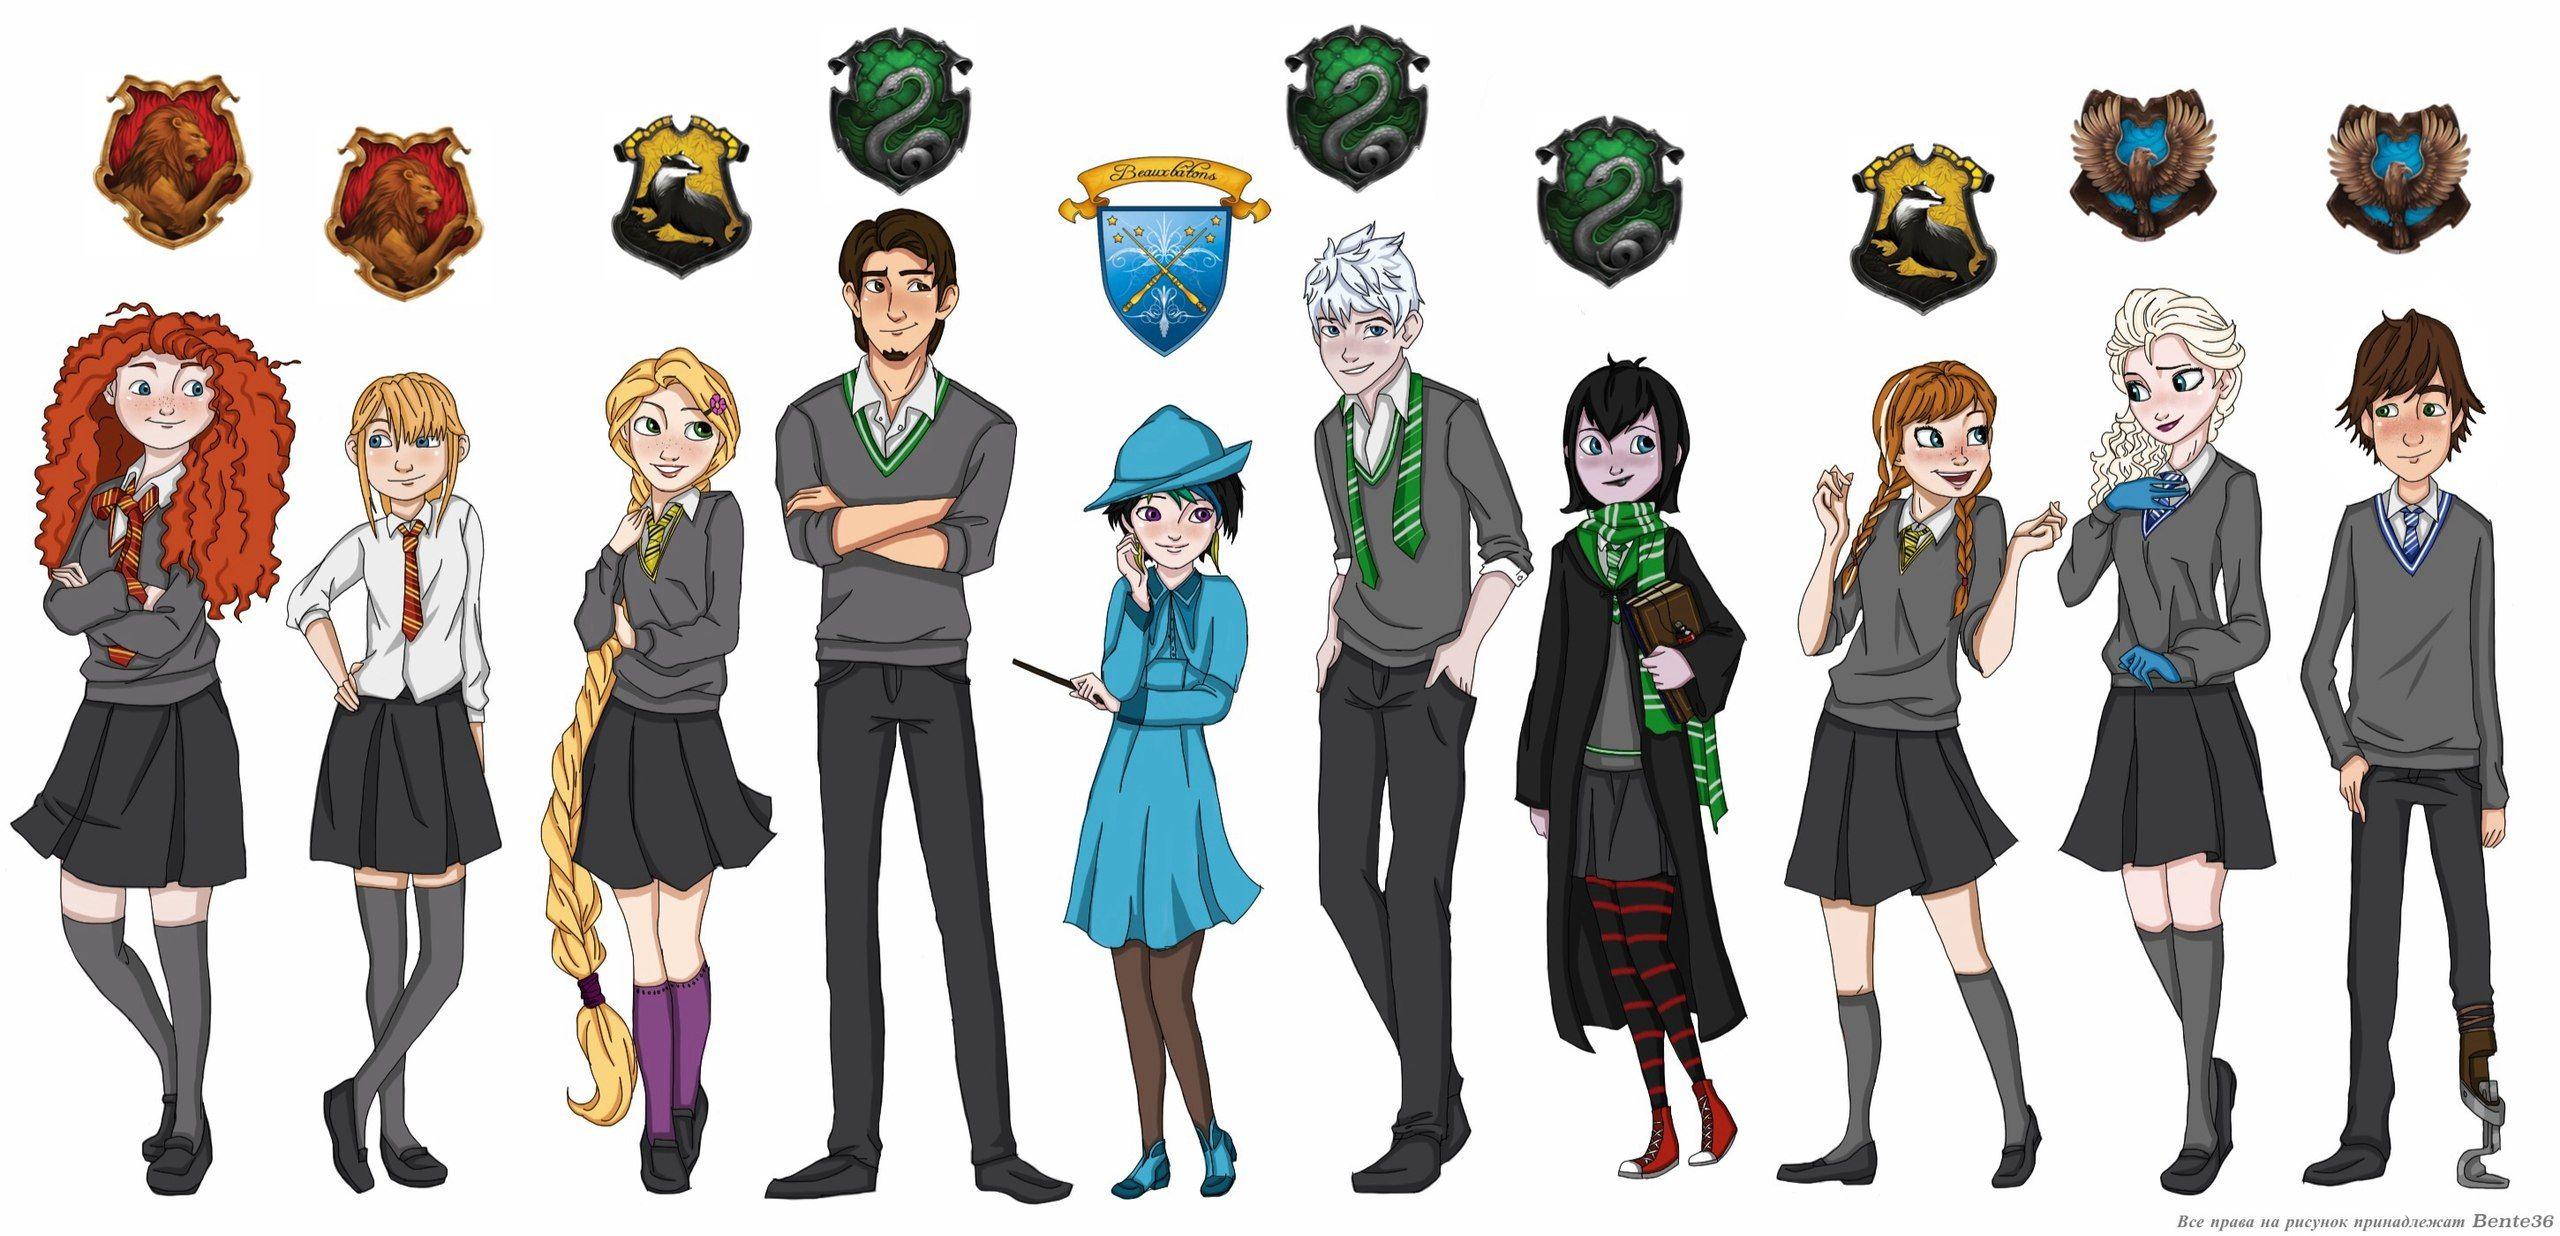 Houses Of Hogwarts Disney Hogwarts Harry Potter Disney Disney And Dreamworks